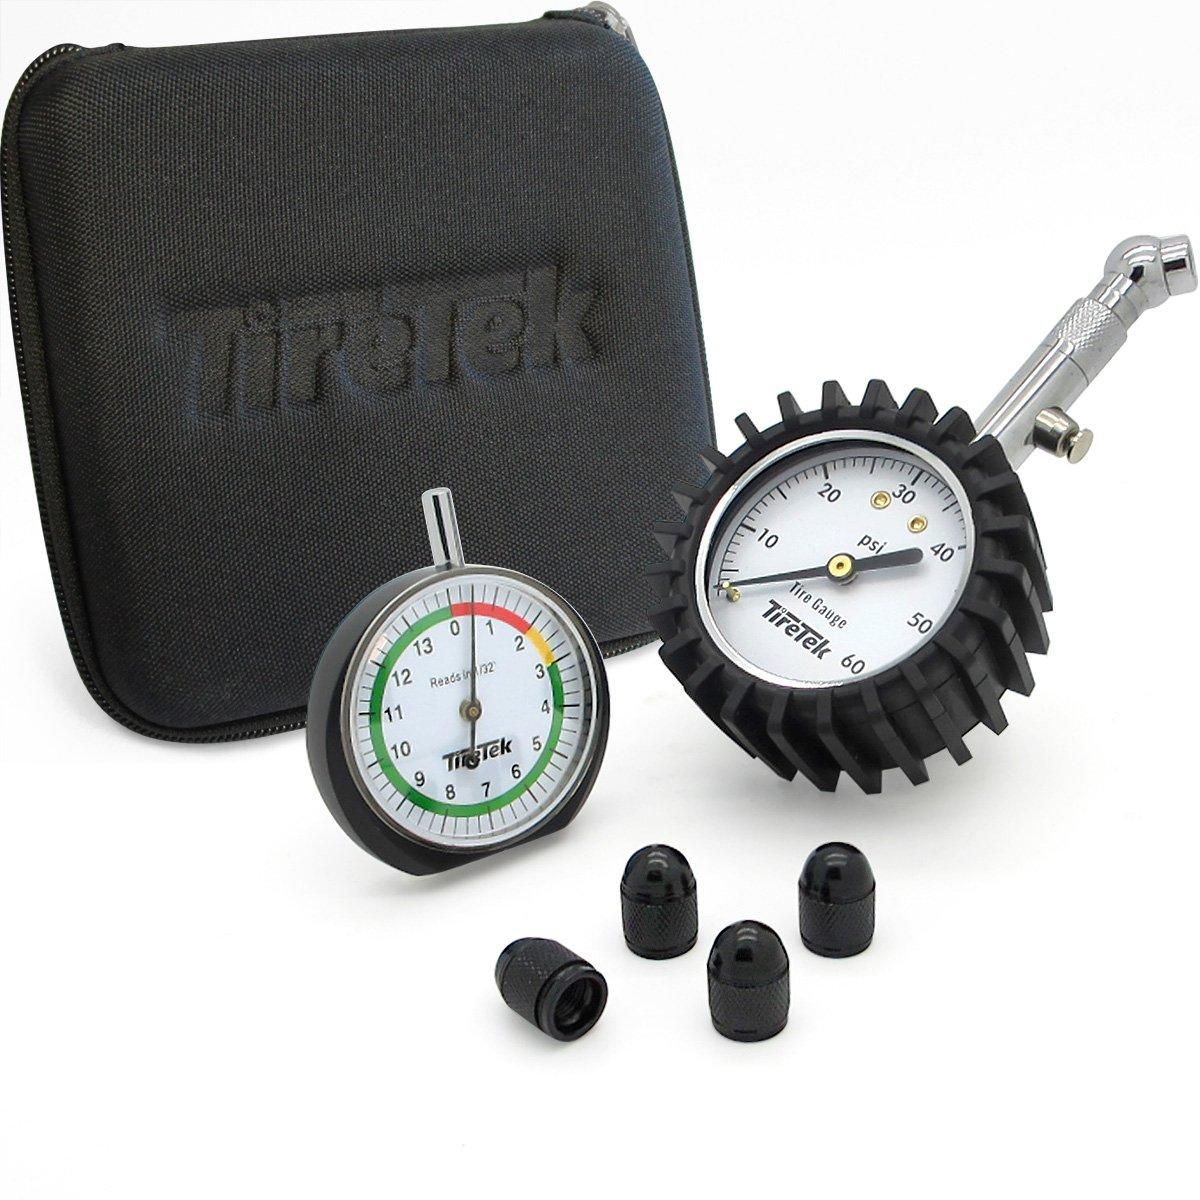 TireTek Truck-Pro Auto Car Tire Pressure Gauge Heavy Duty Air Pressure 100 PSI